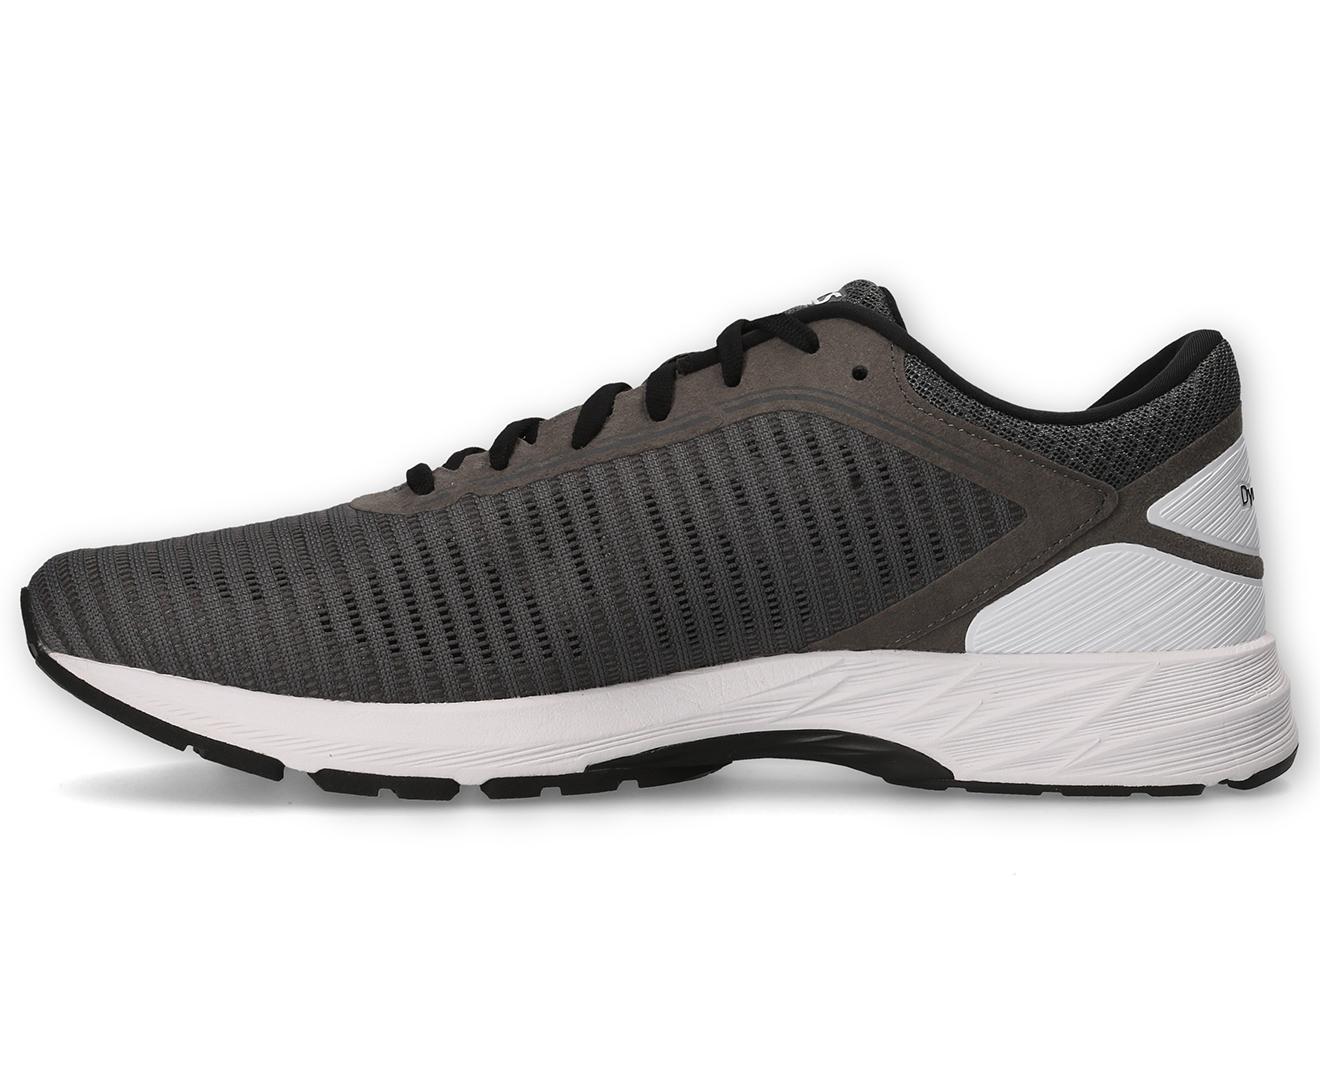 4e03bcf68abf ASICS Men s Dynaflyte 2 Shoe - Carbon White Black